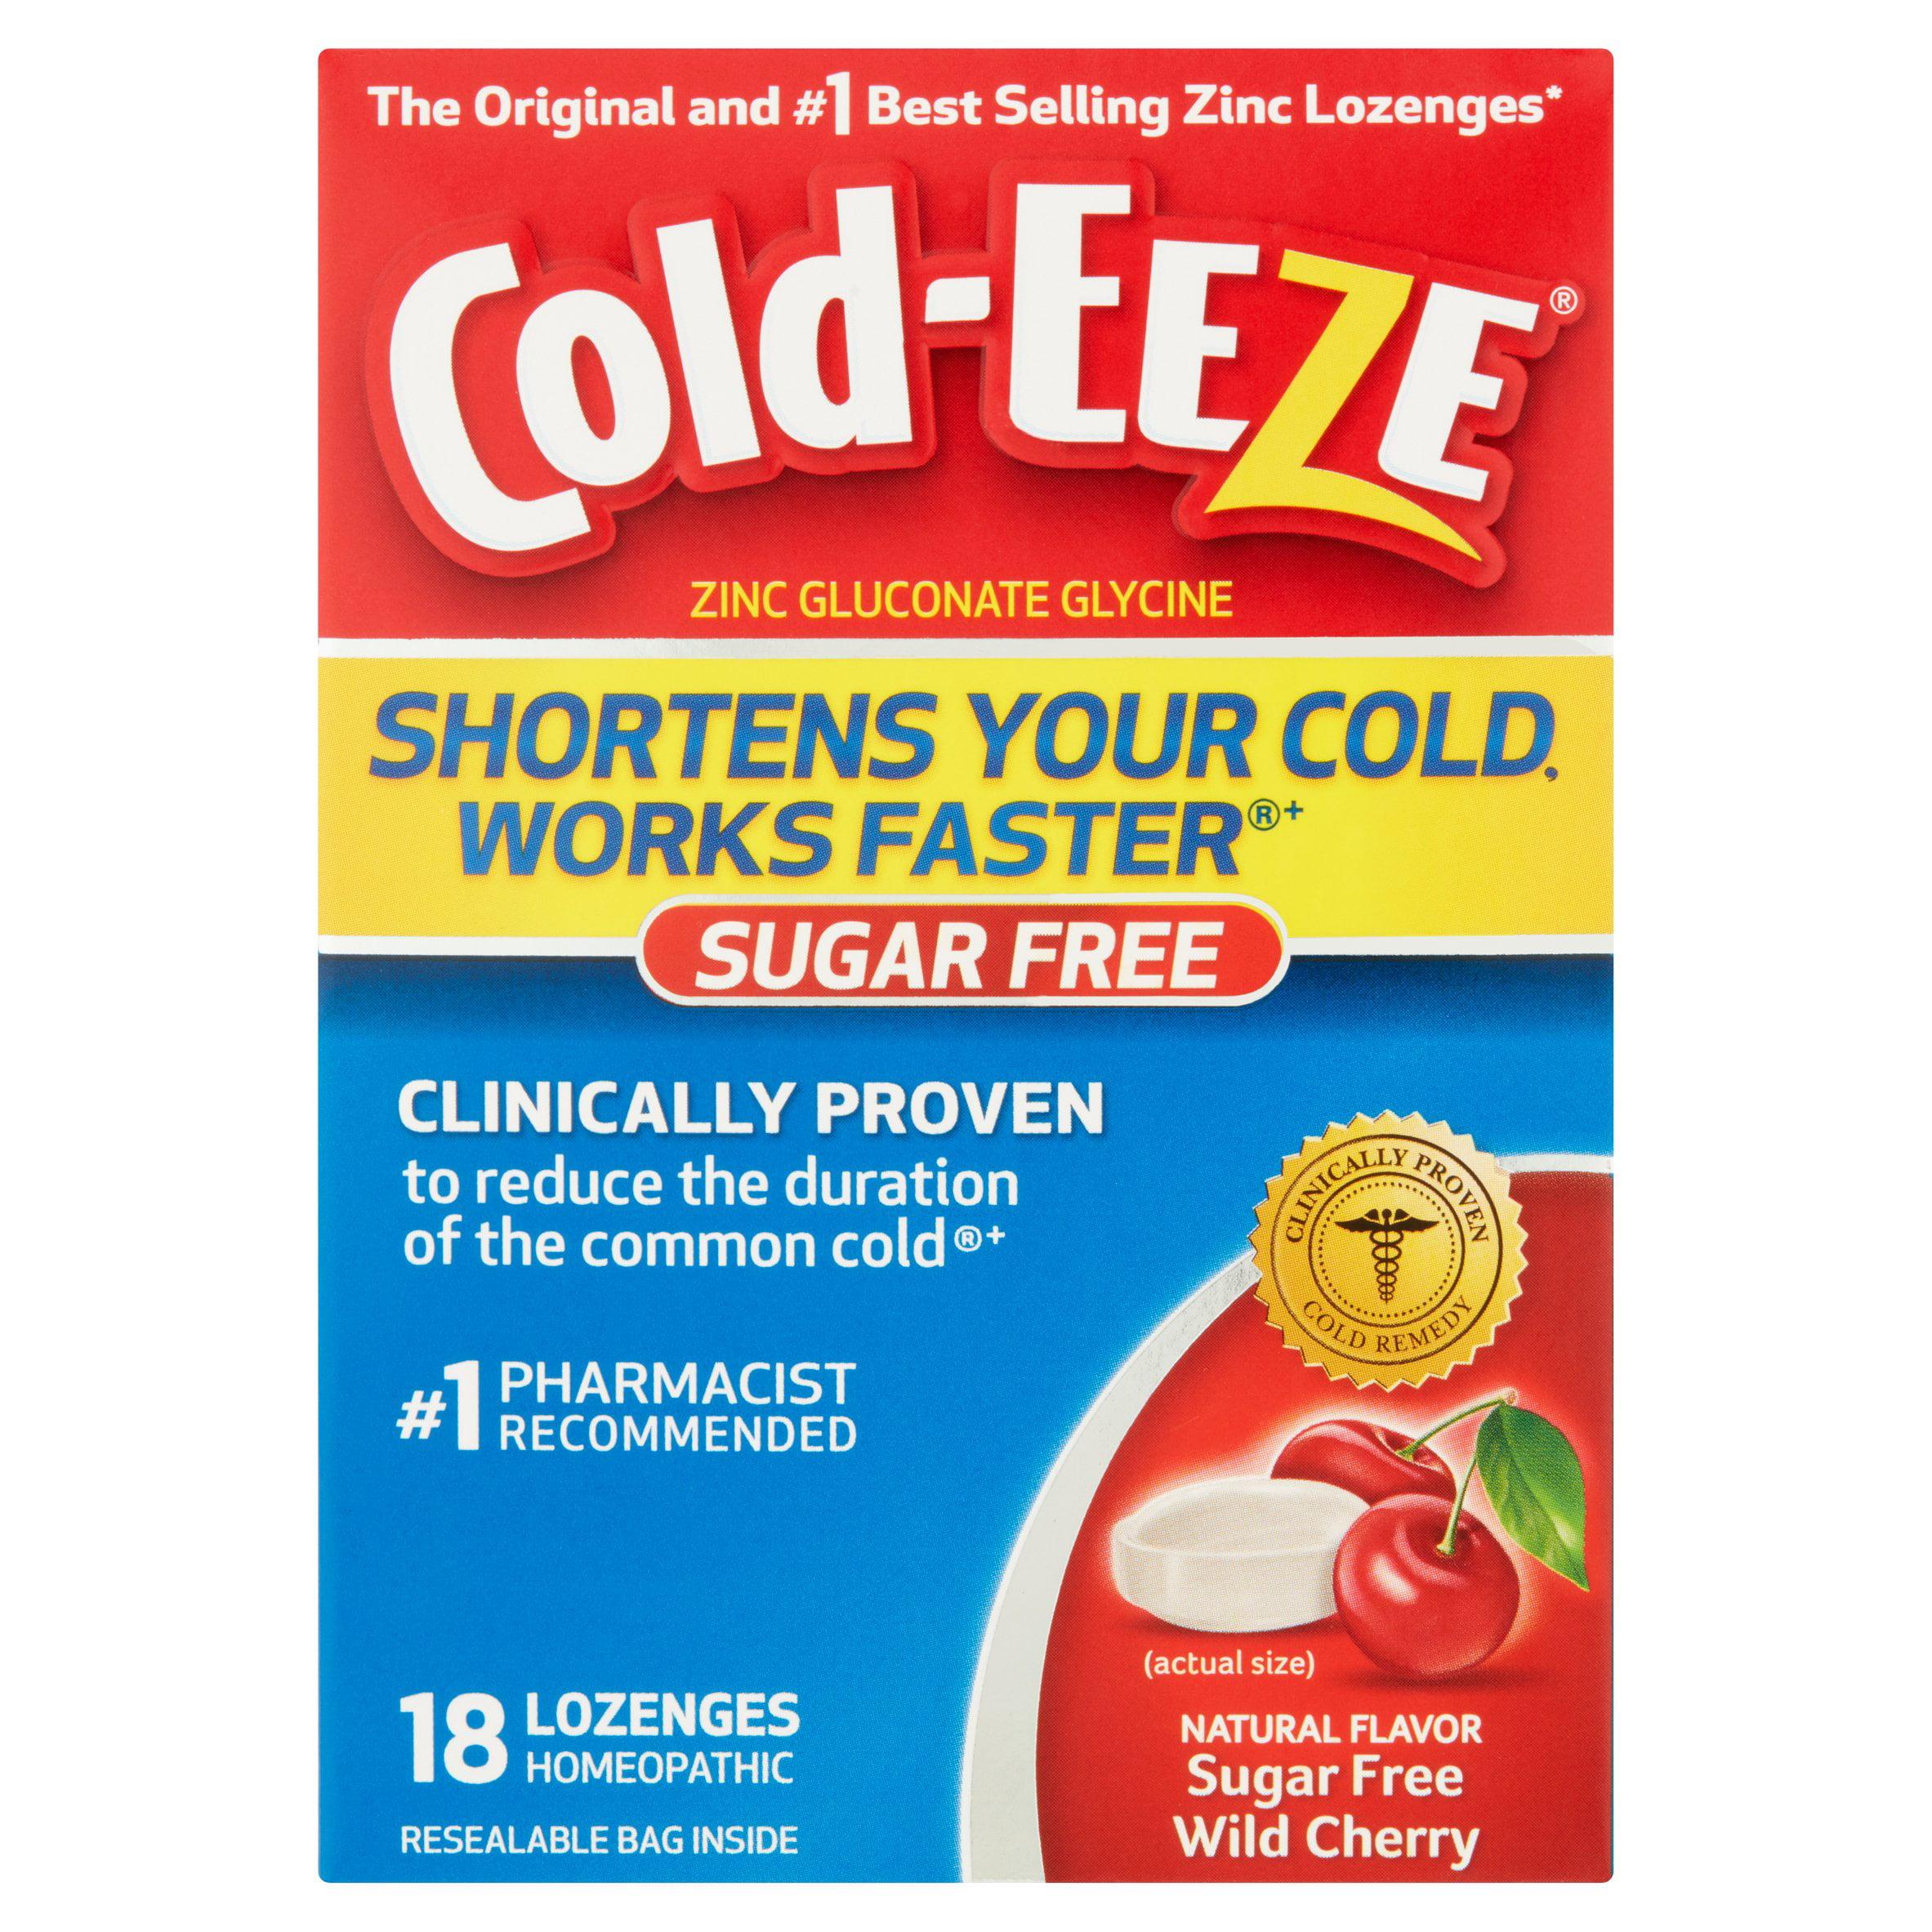 Cold-Eeze Zinc Gluconate Glycine Homeopathic Wild Cherry Lozenges, 18 count